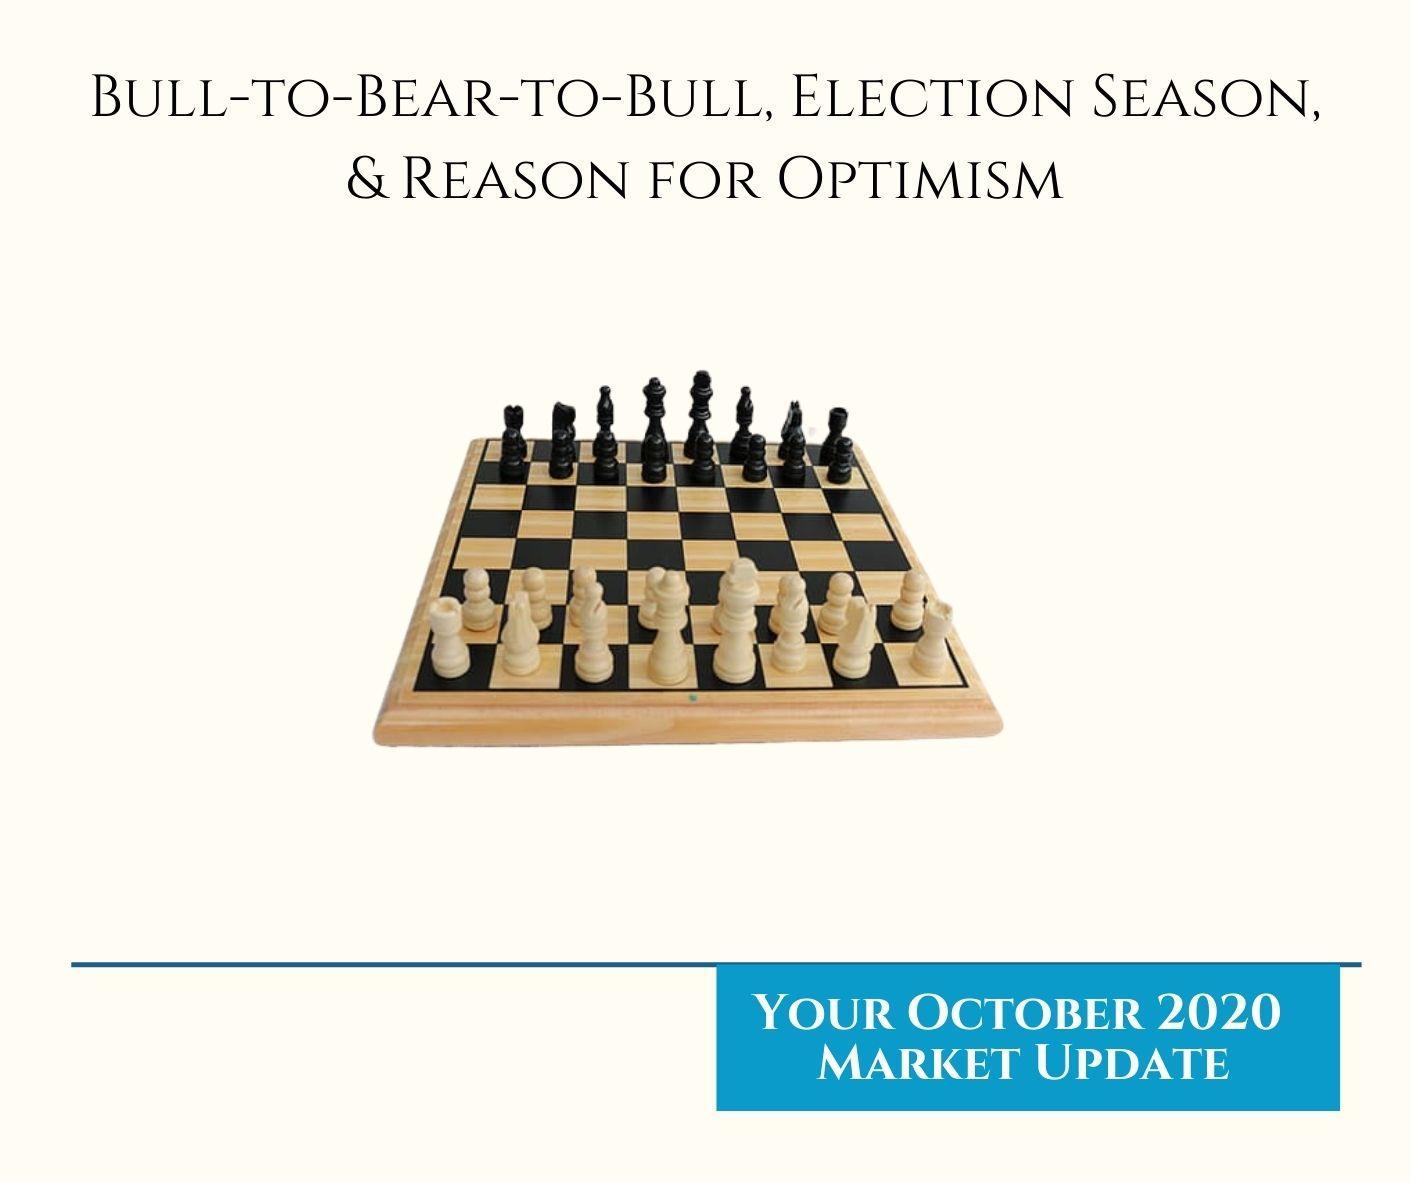 Bull-to-Bear-to-Bull, Election Season, and Reason for Optimism Thumbnail